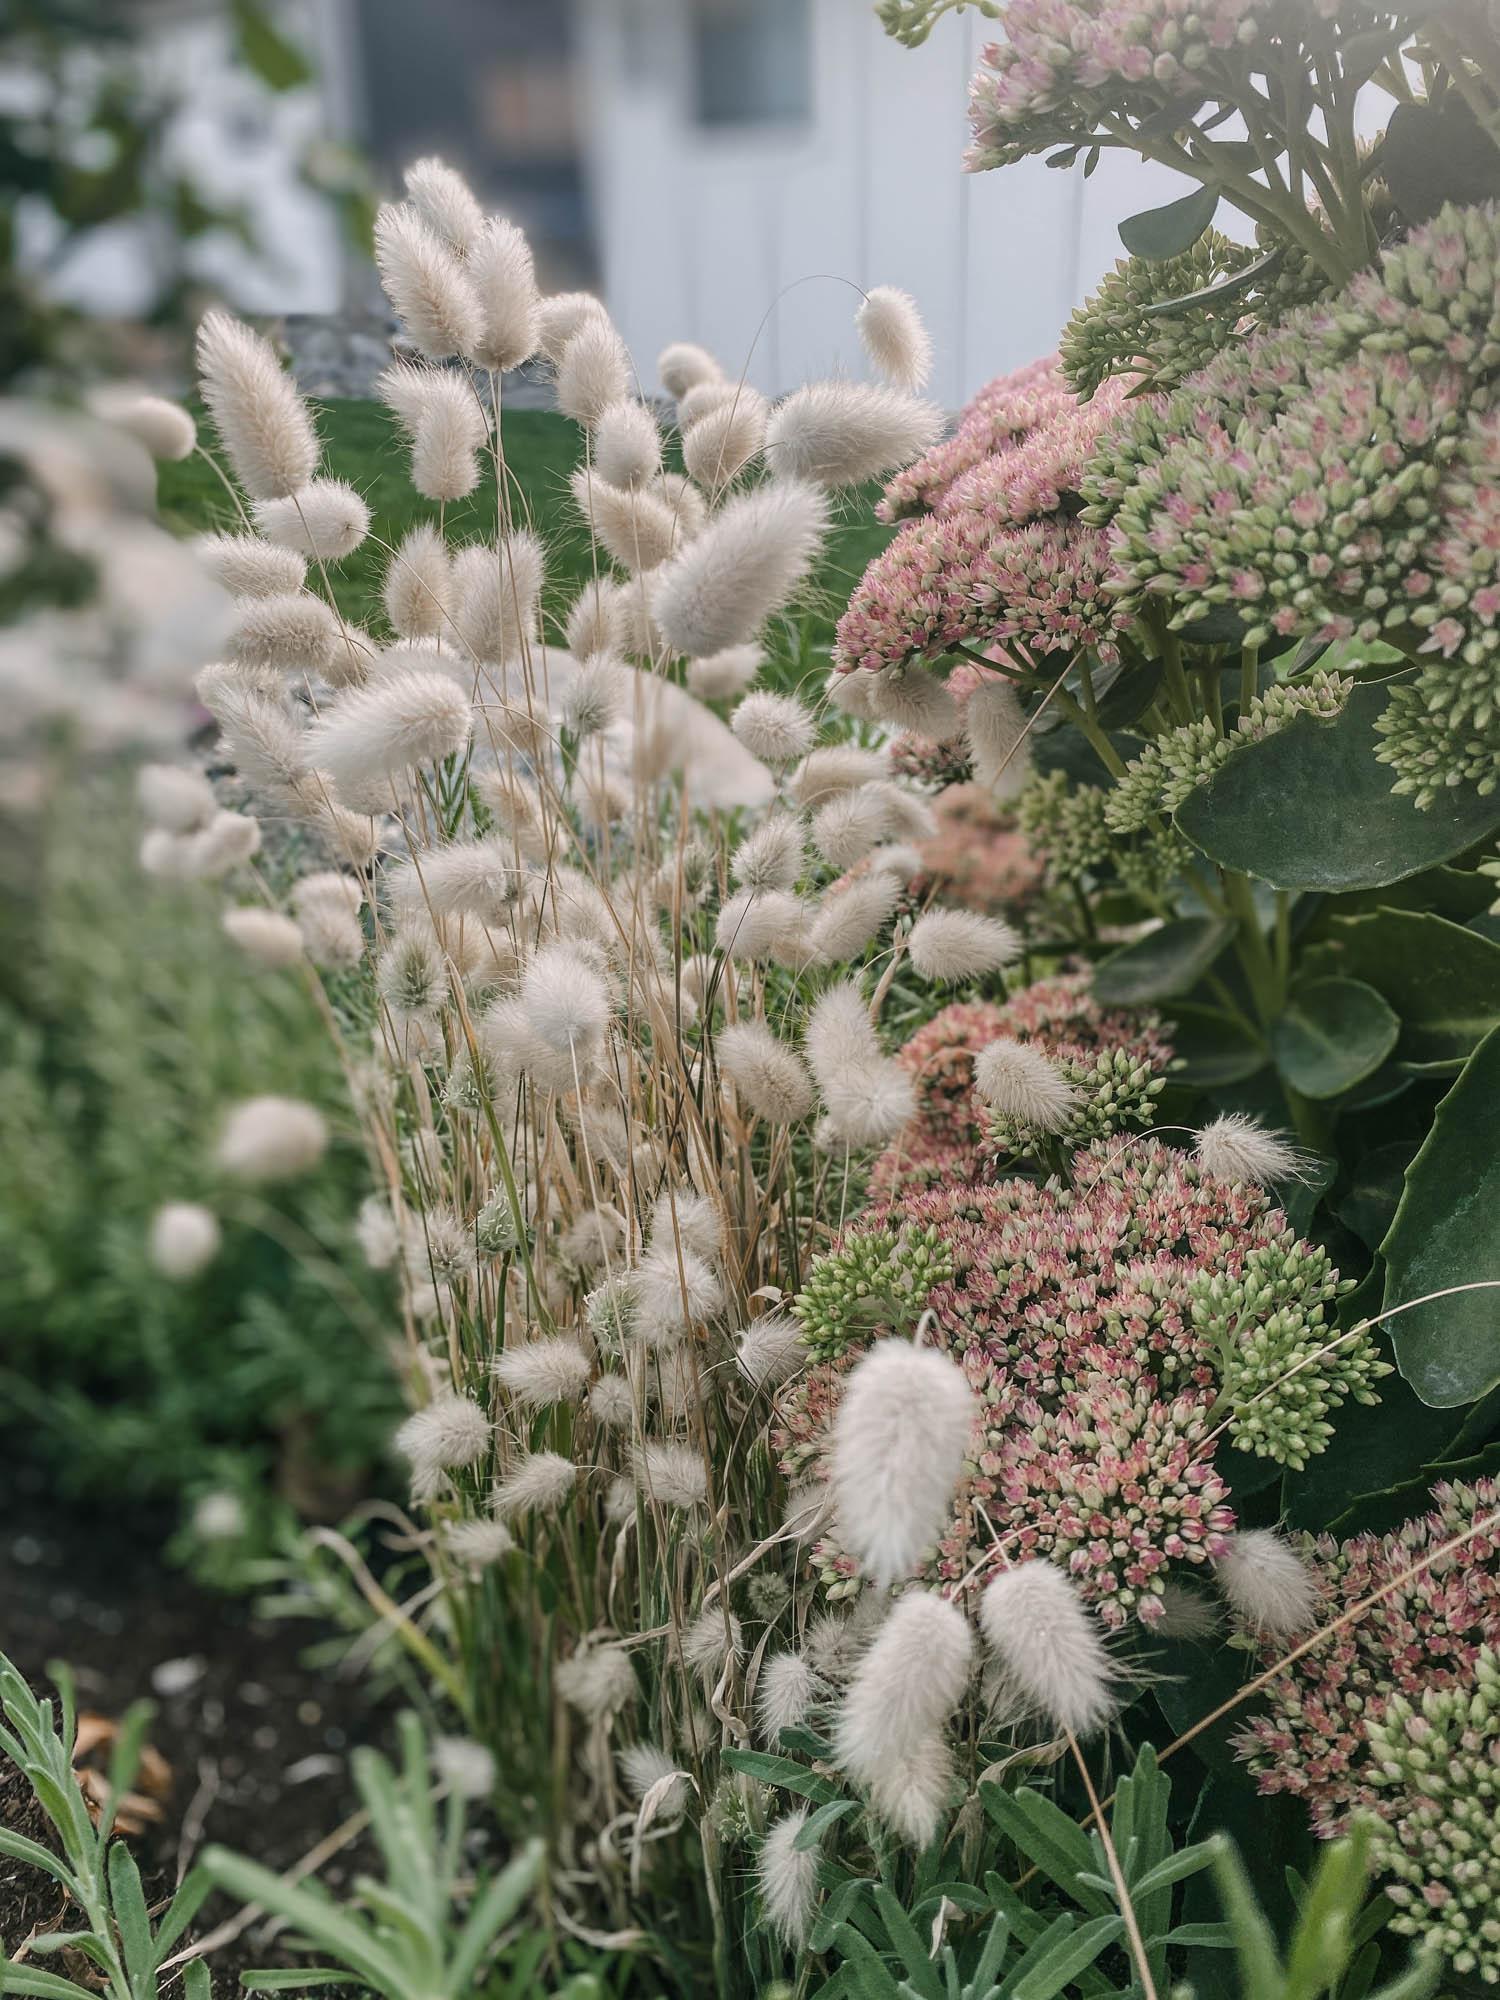 Grow bunny tail grasses